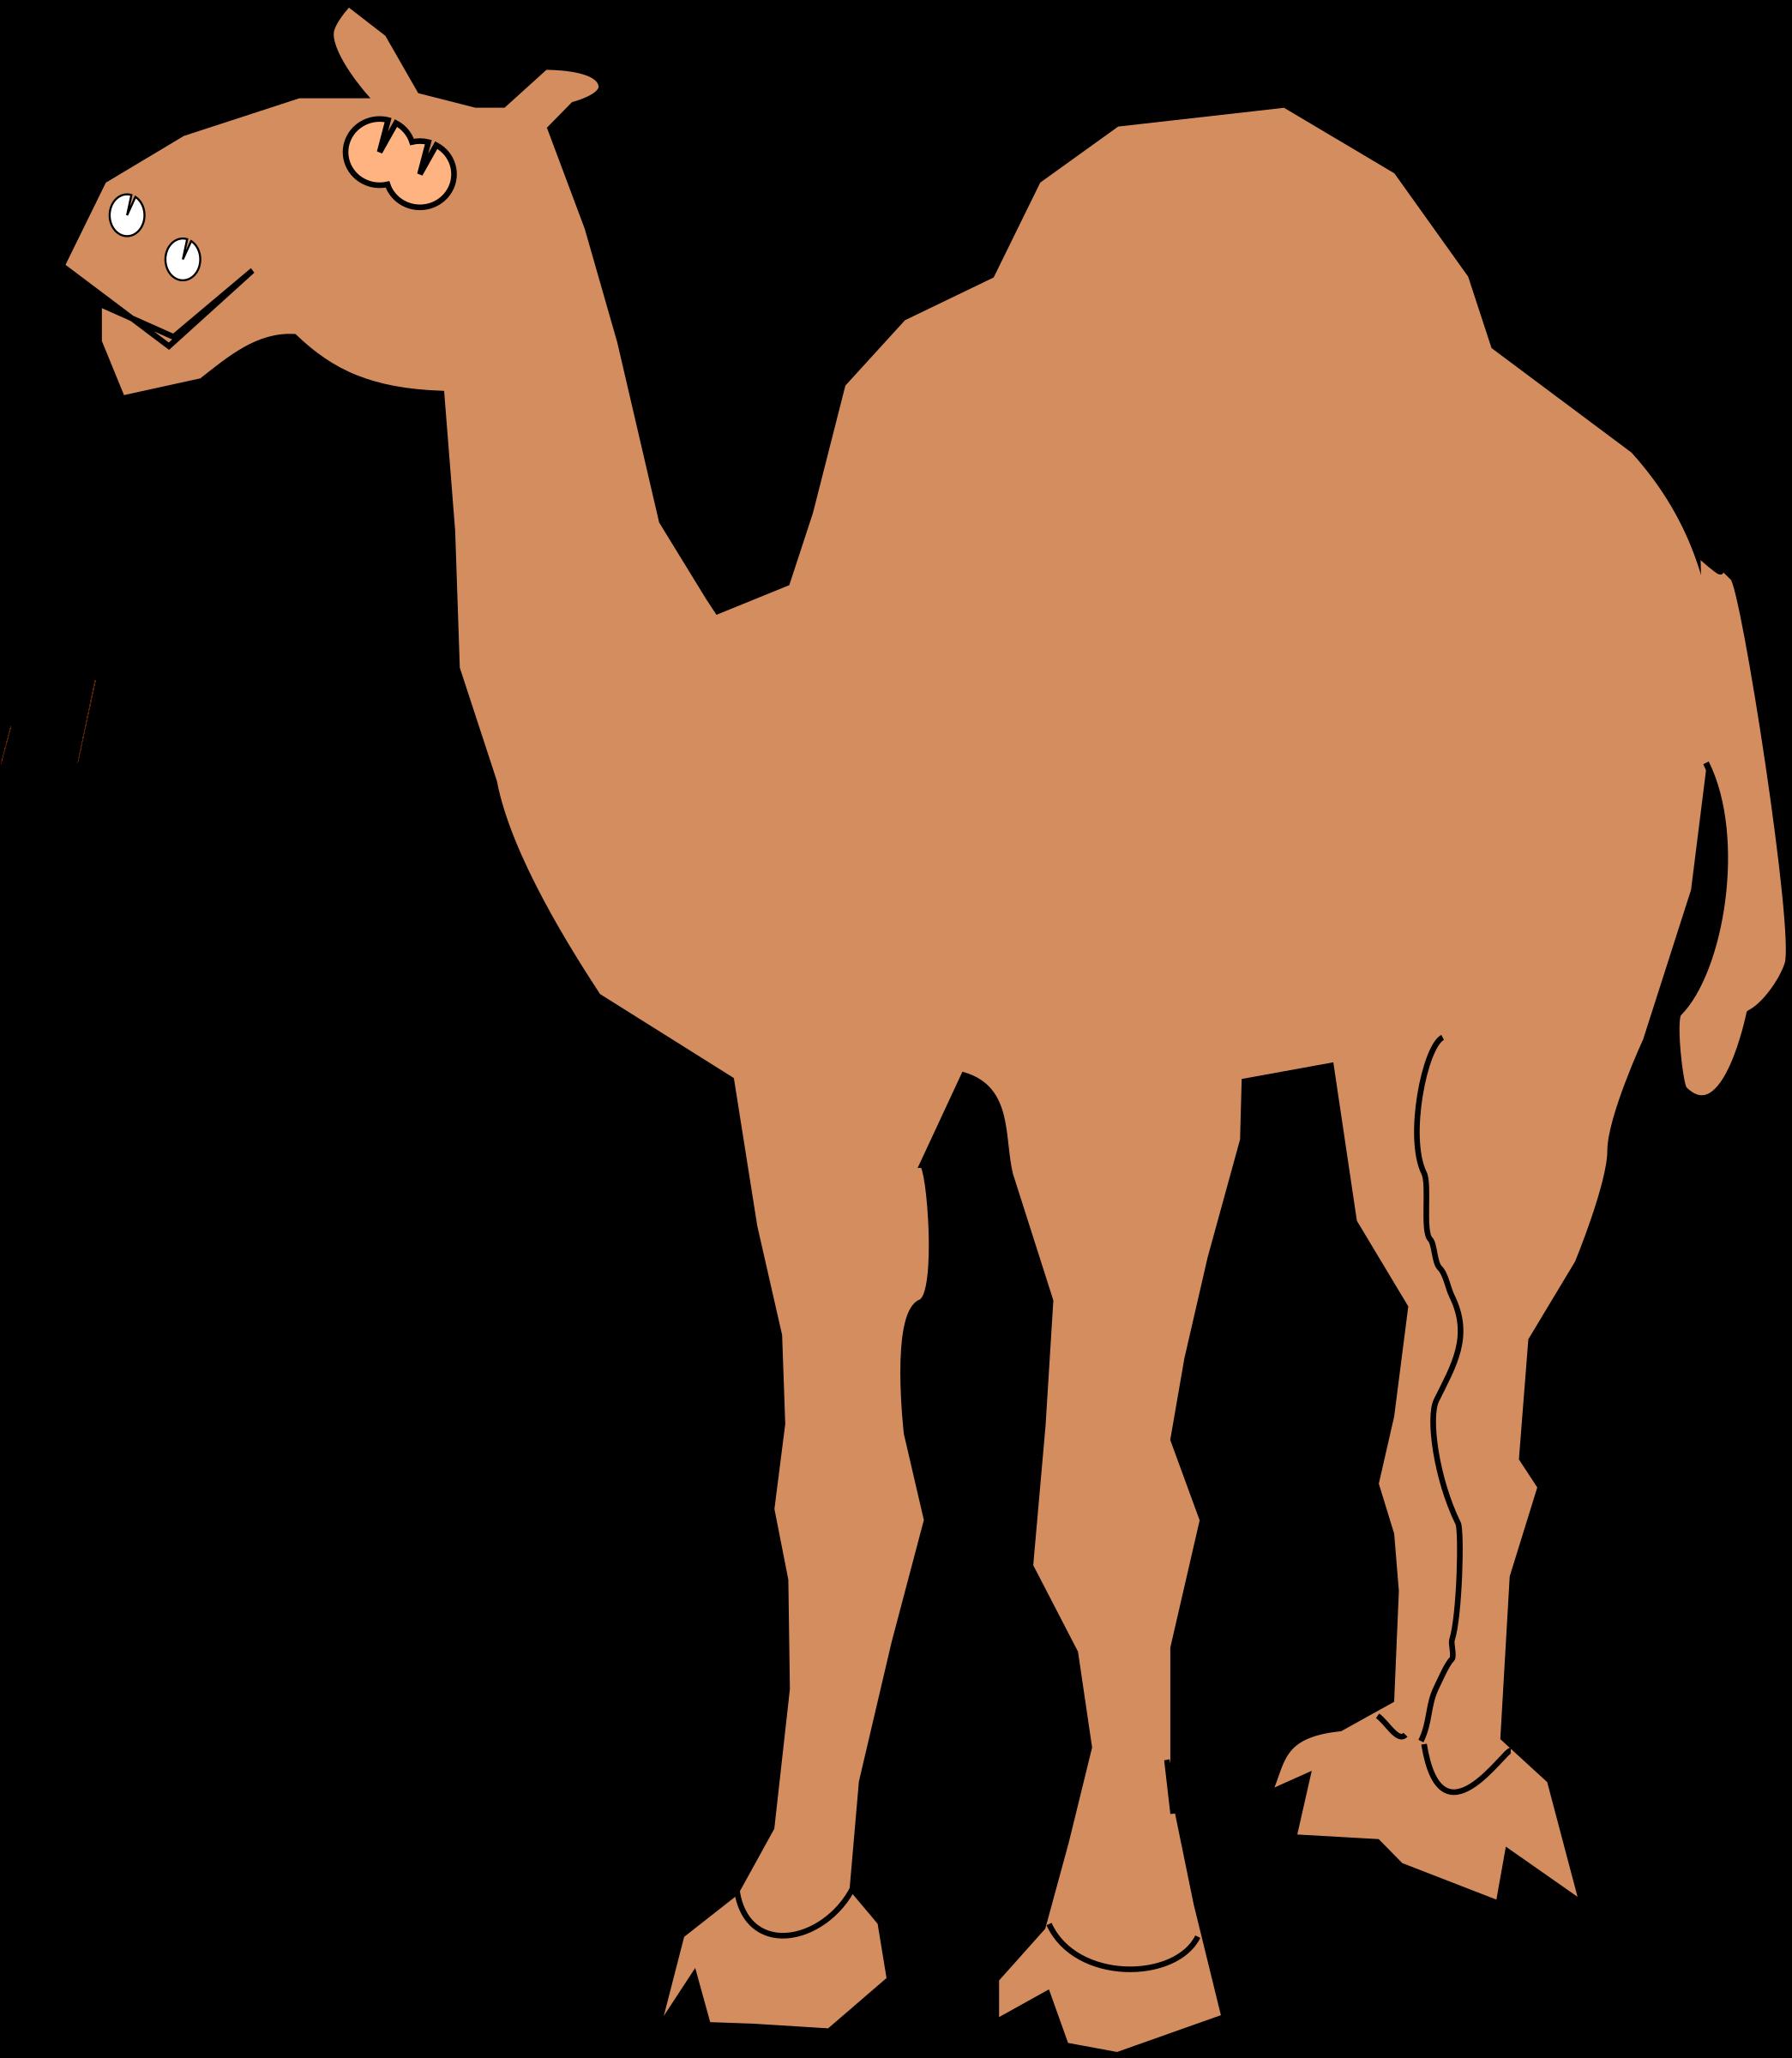 Camel clipart big animal Camel Camel Clipart